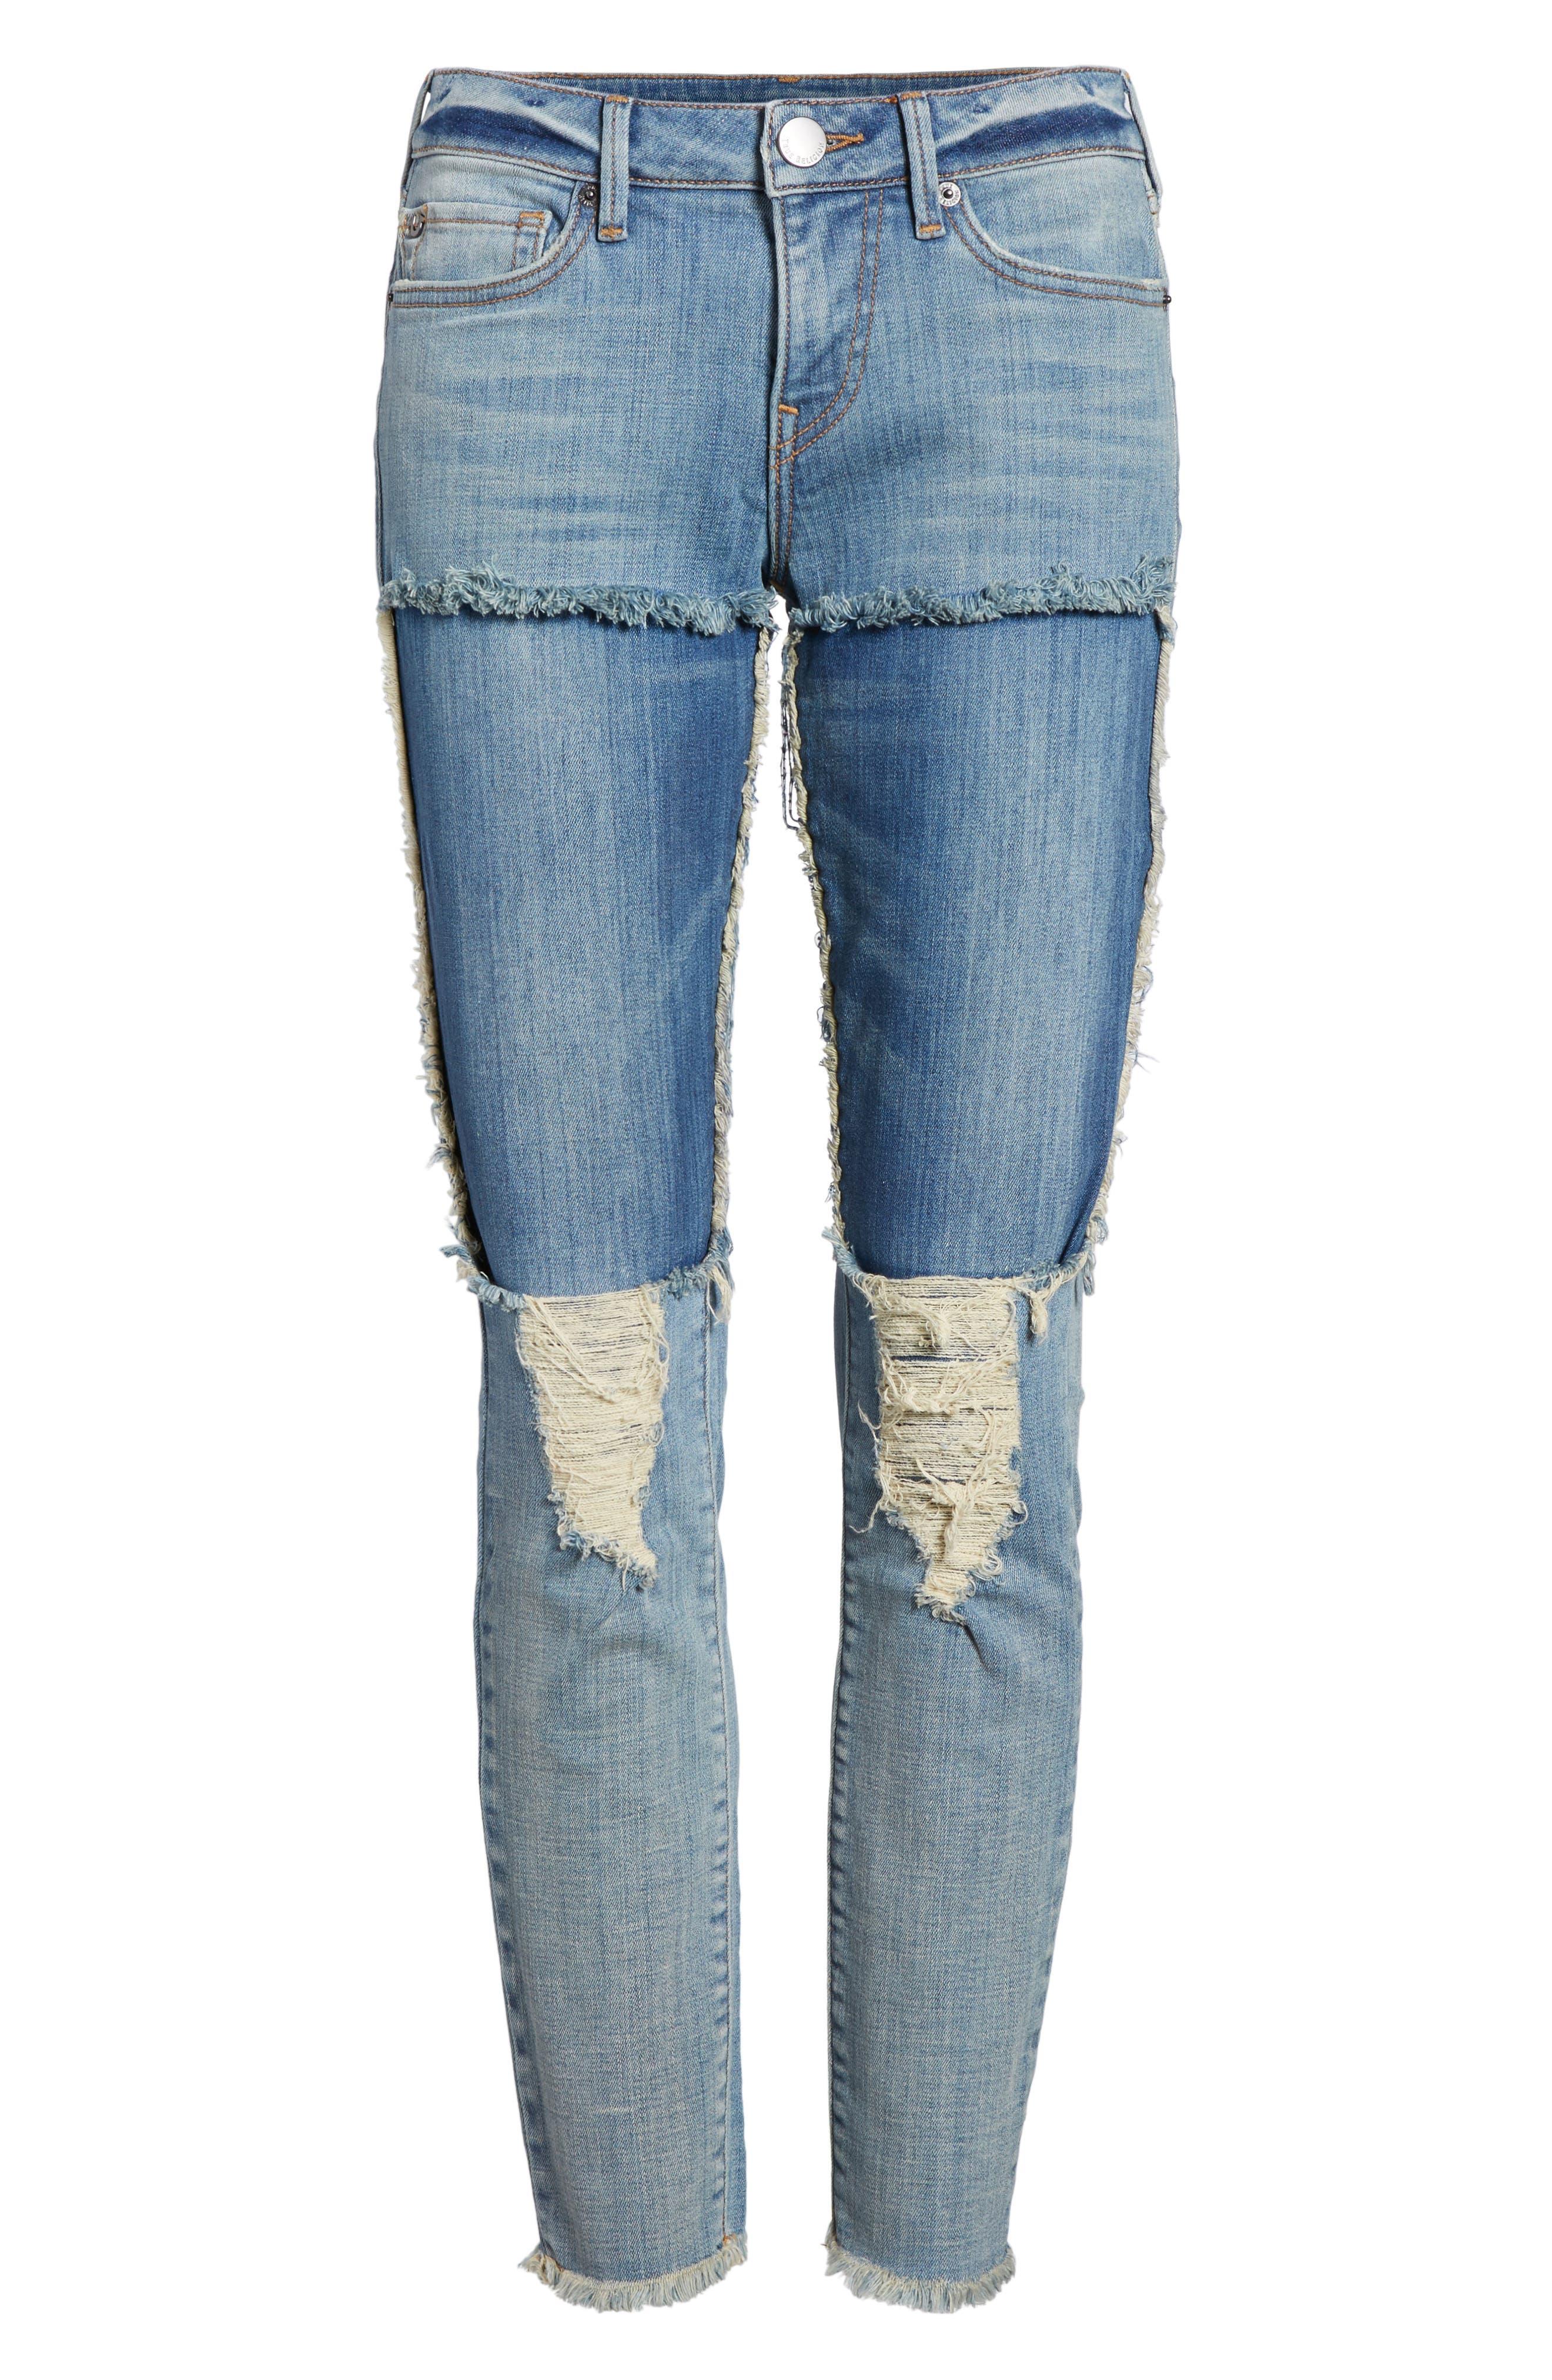 Halle Super Skinny Jeans,                             Alternate thumbnail 7, color,                             401